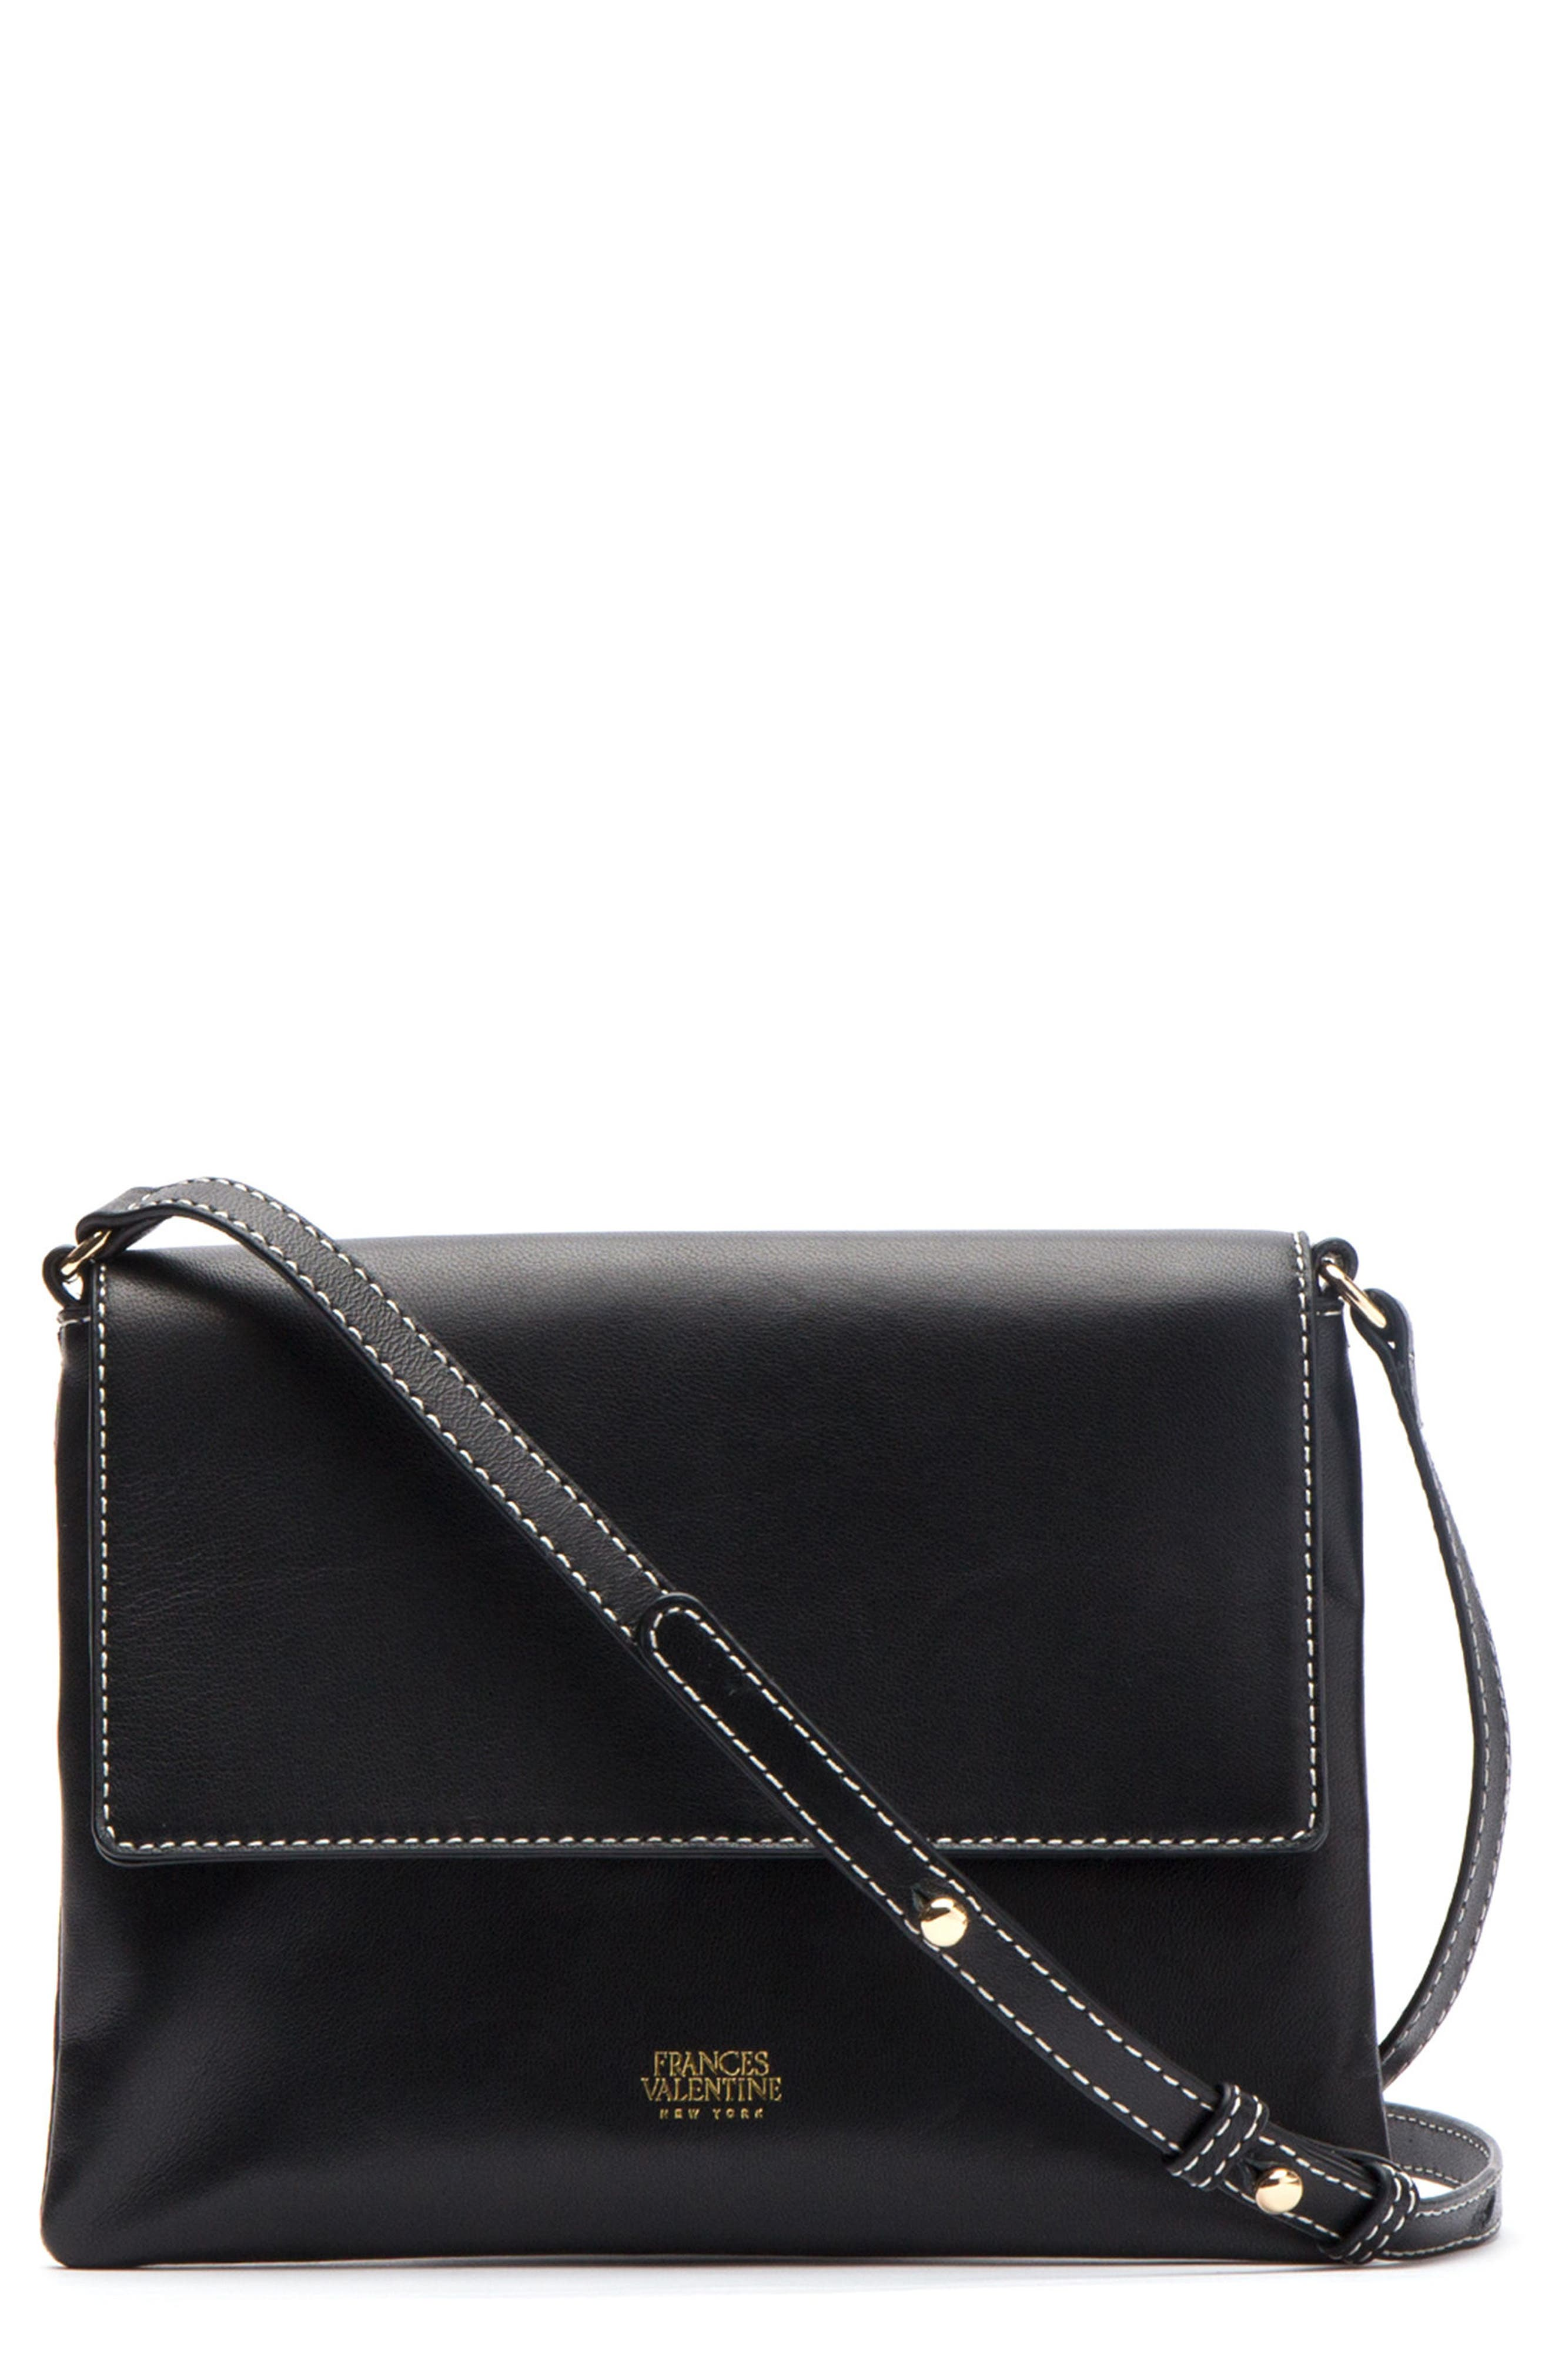 Alternate Image 1 Selected - Frances Valentine Maggie Leather Crossbody Bag